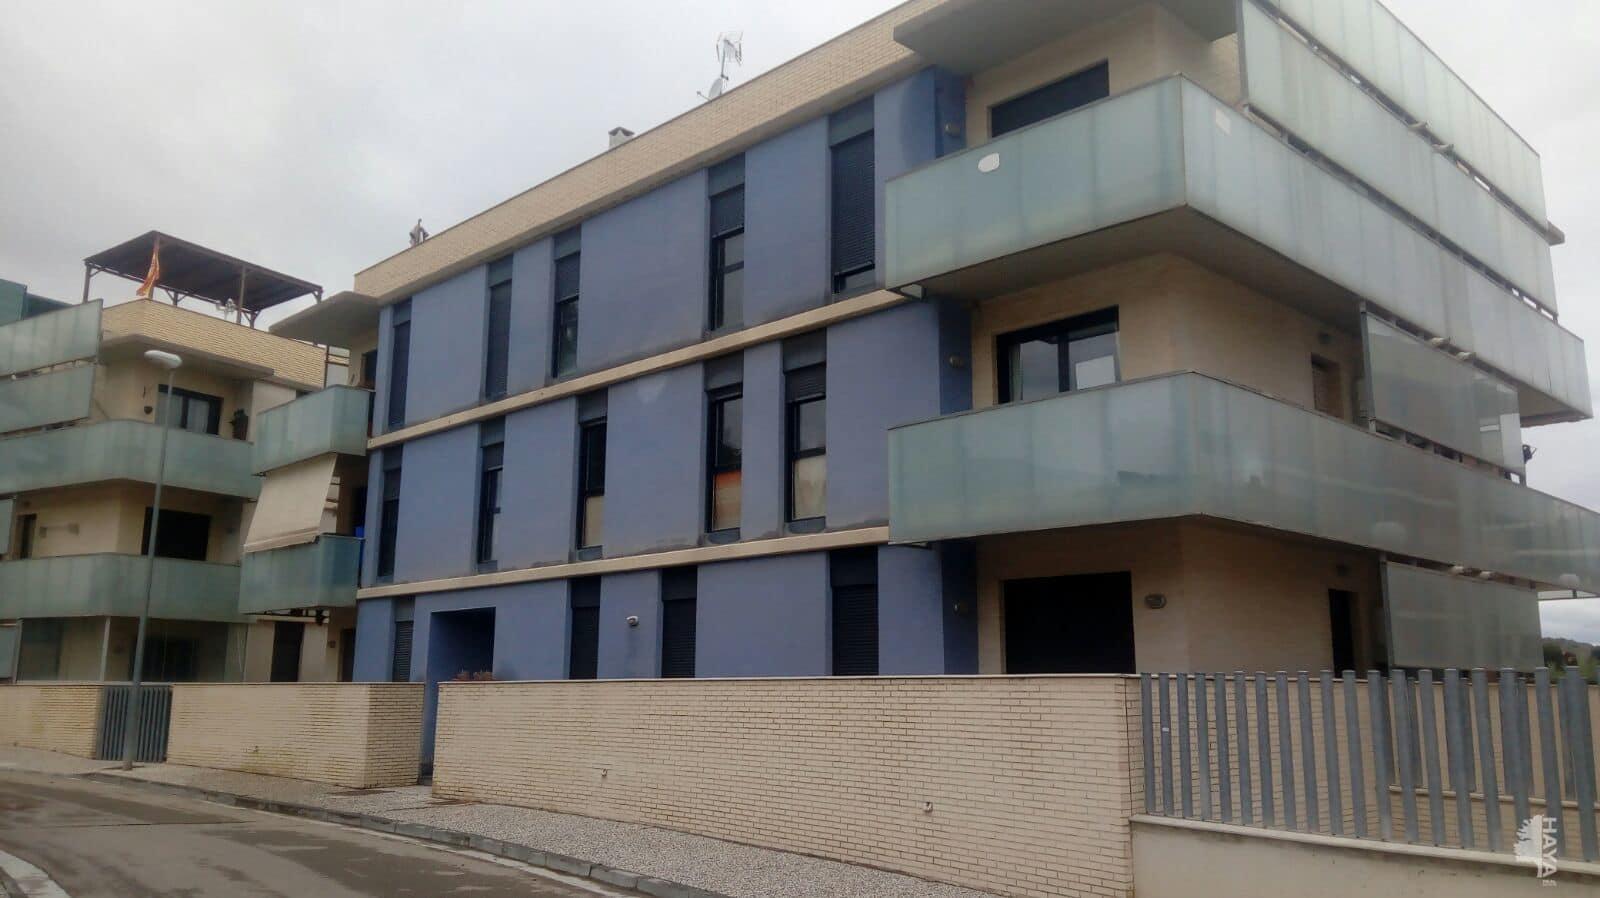 Parking en venta en Cadrete, Zaragoza, Calle Camino de Maria, Cadrete, 9.800 €